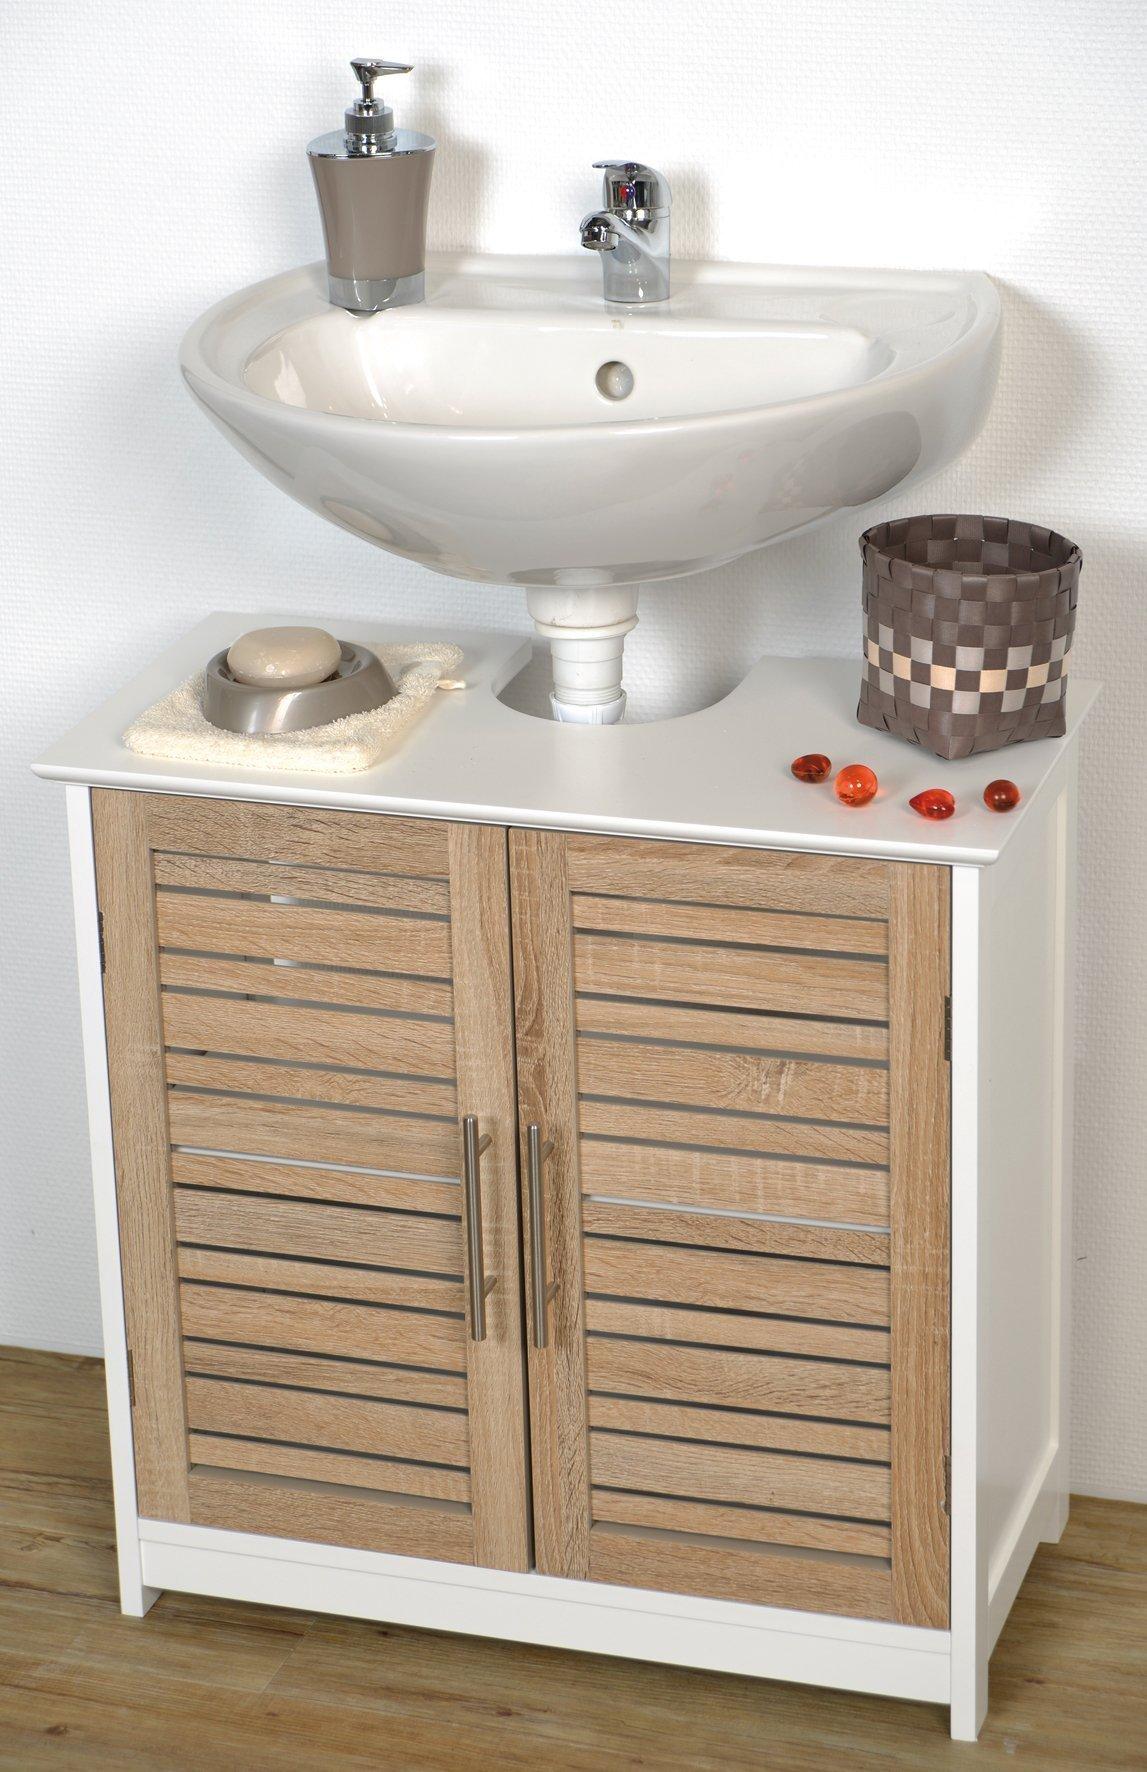 EVIDECO 9900306 Free Standing  Non Pedestal Under Sink Vanity Cabinet, Bath Storage Stockholm